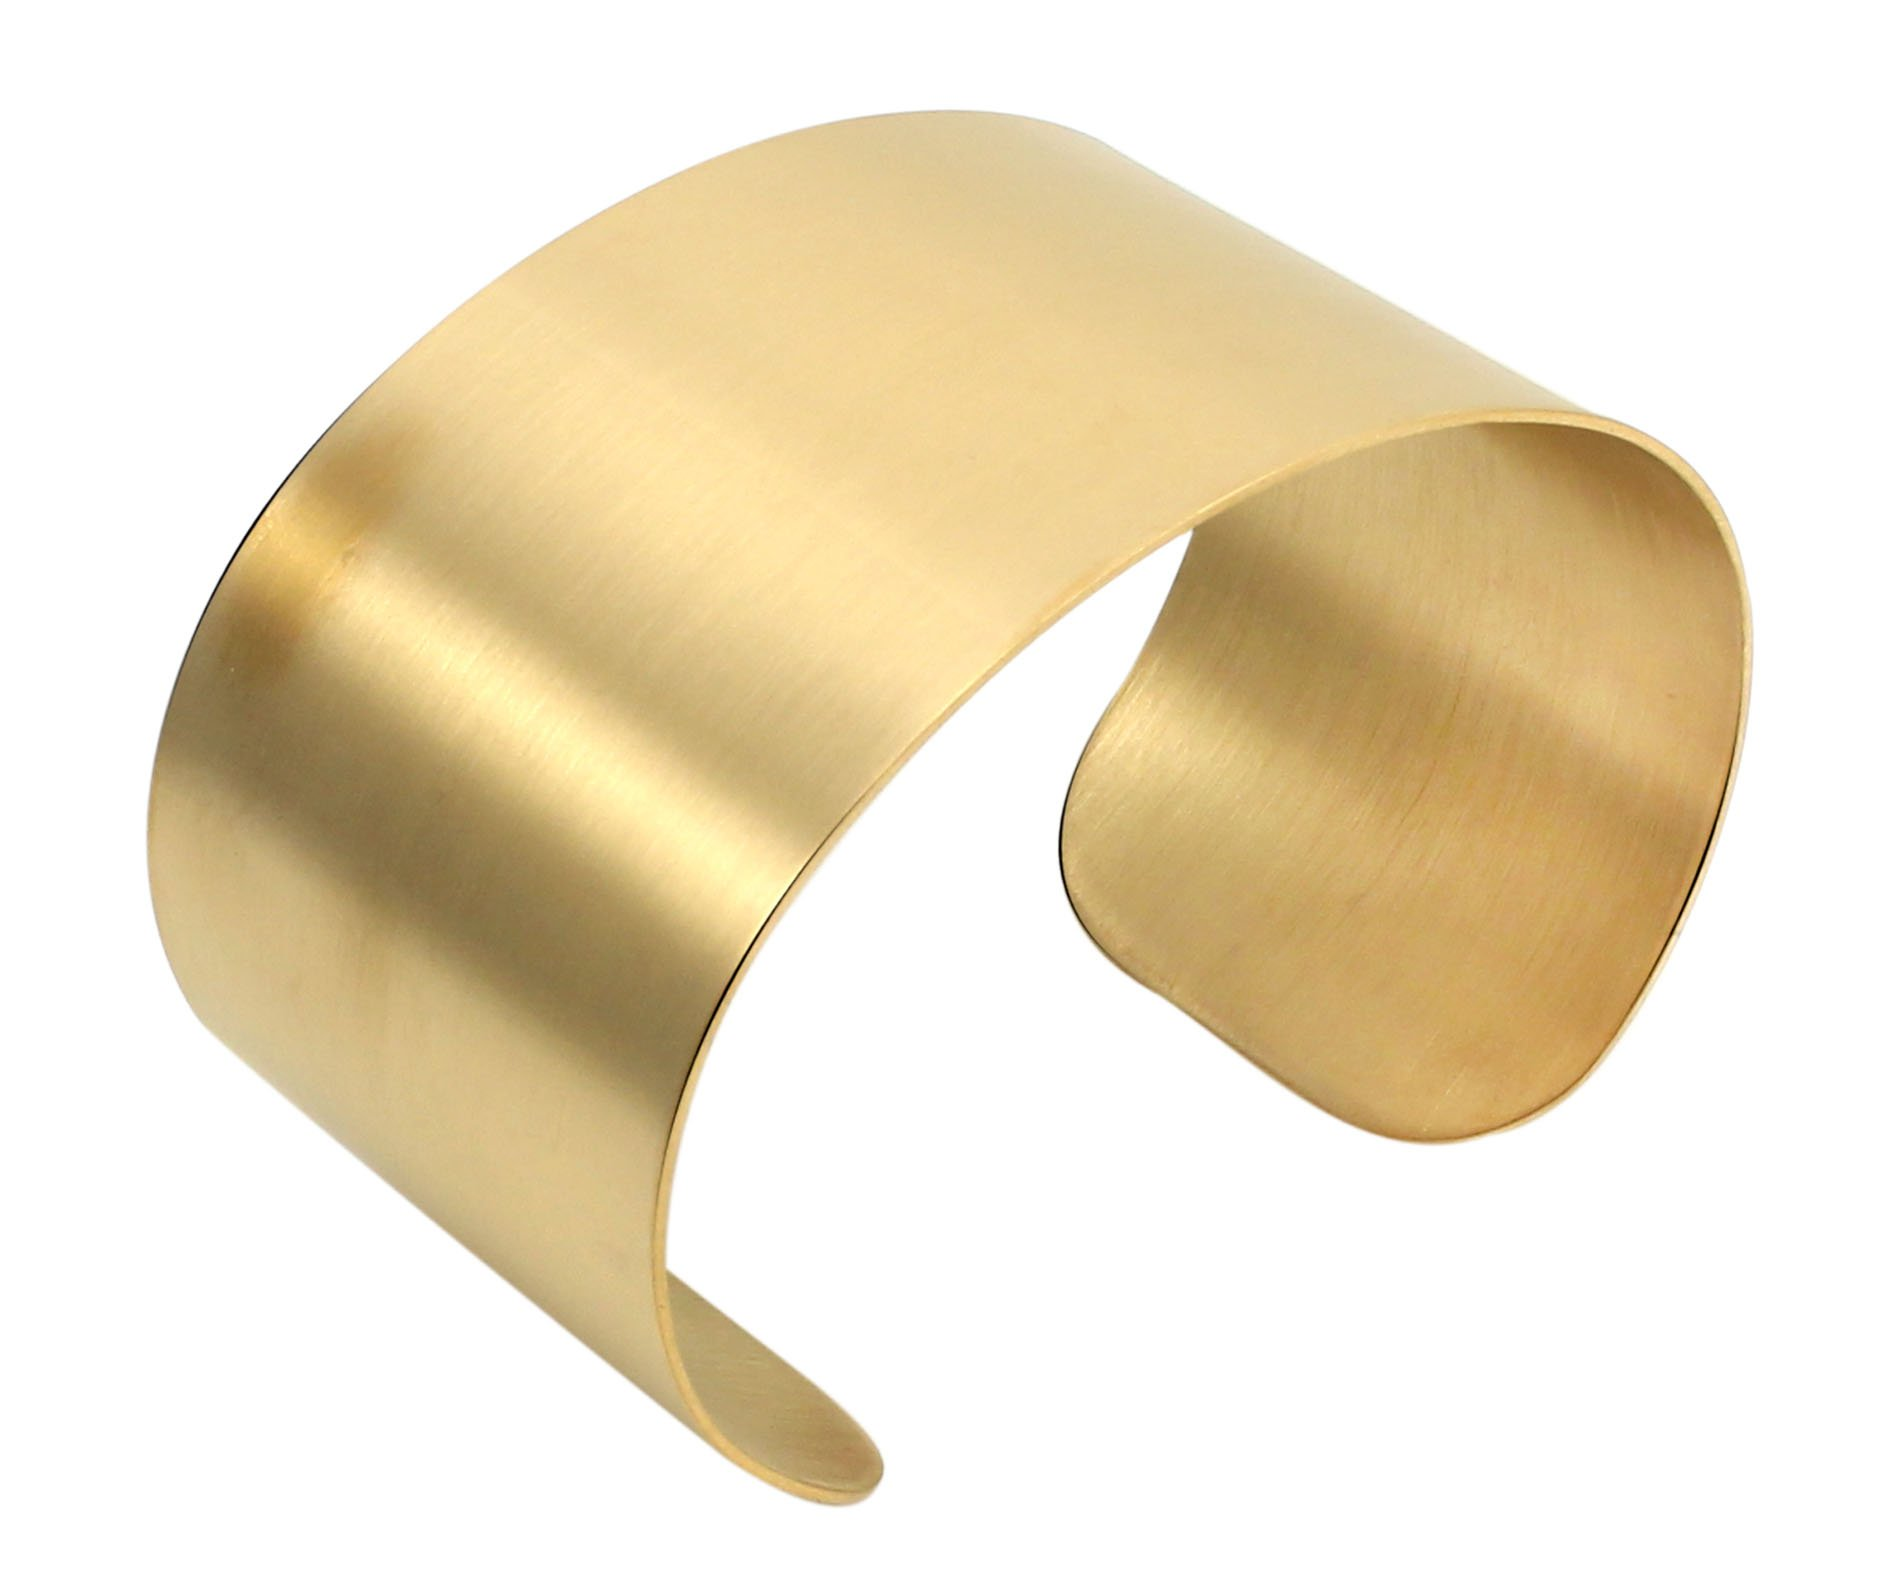 COUYA Gold Plated Wide Matt Cuff Bangle Bracelets for Women Blank Satin Bracelet Wristband Adjustable Size